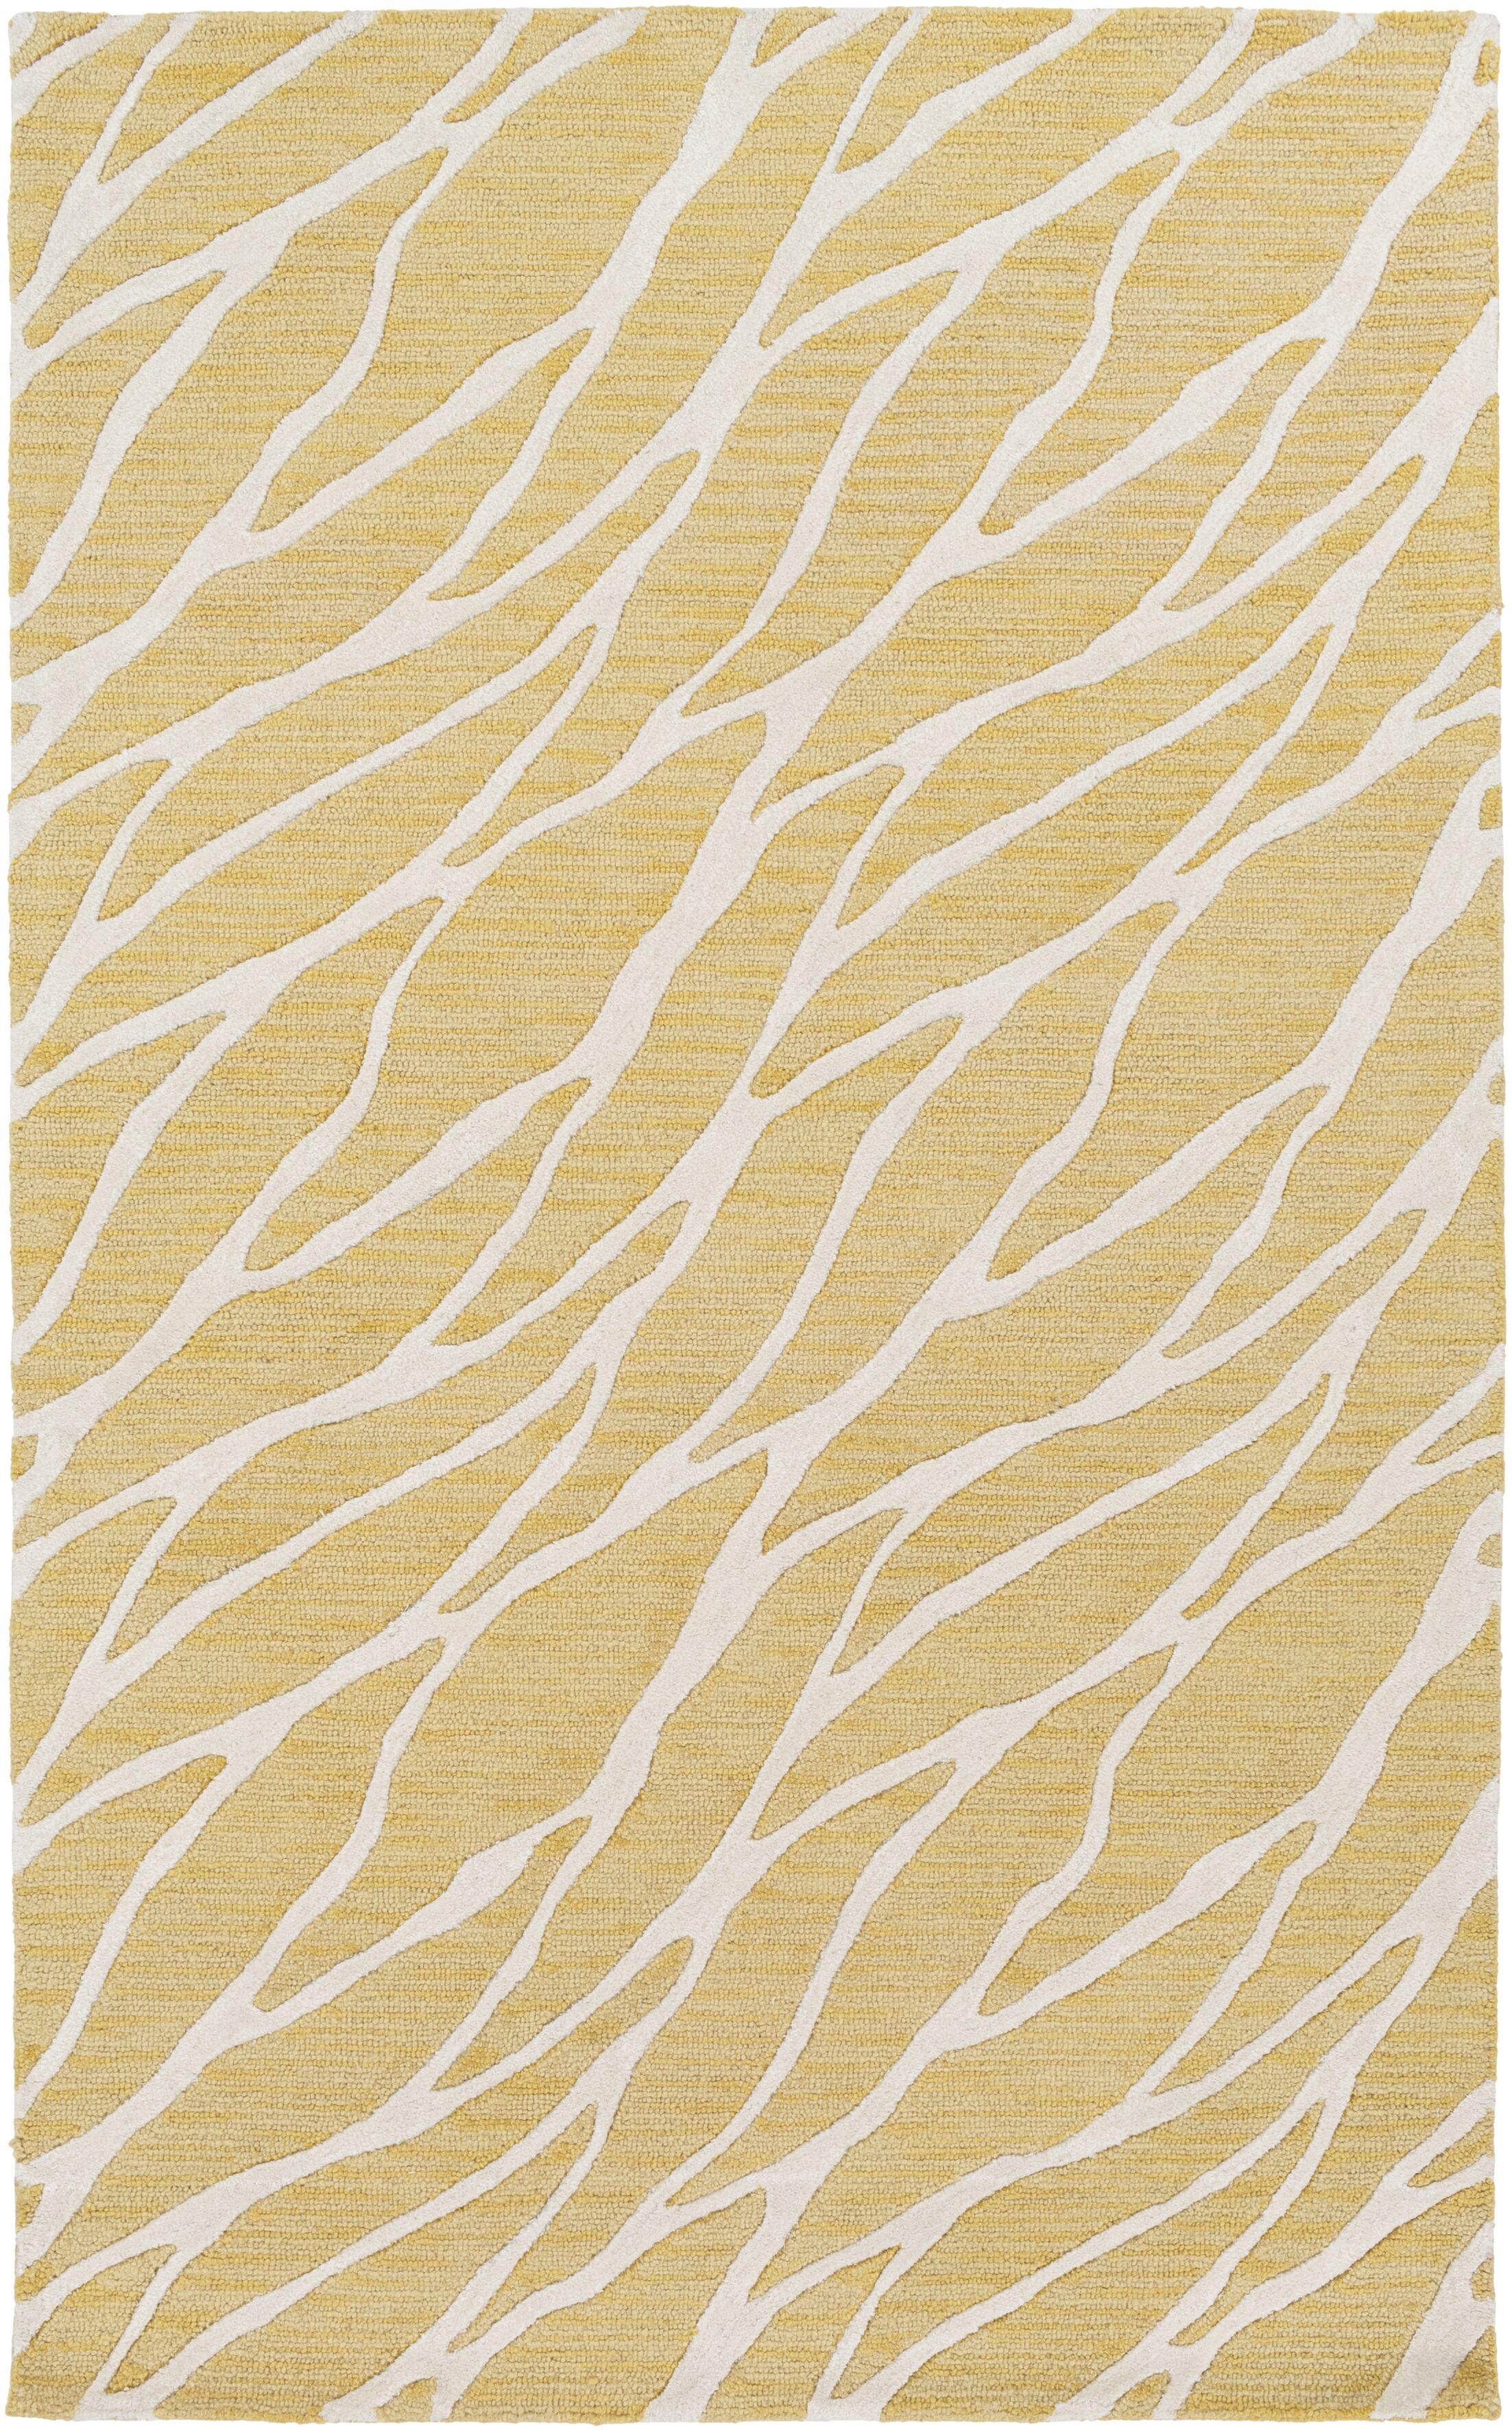 Blewett Hand-Tufted Gold/Ivory Area Rug Rug Size: Rectangle 8' x 10'